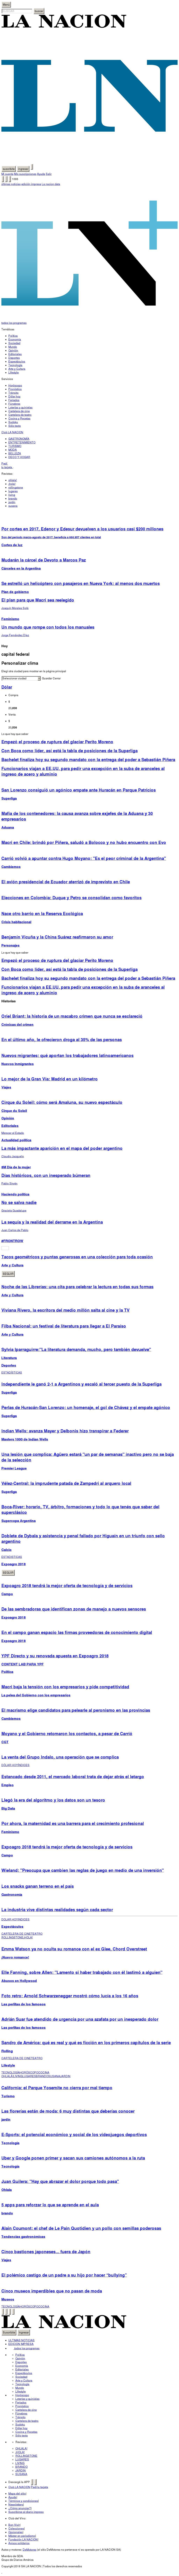 lanacion.com at Monday March 12, 2018, 4:14 a.m. UTC